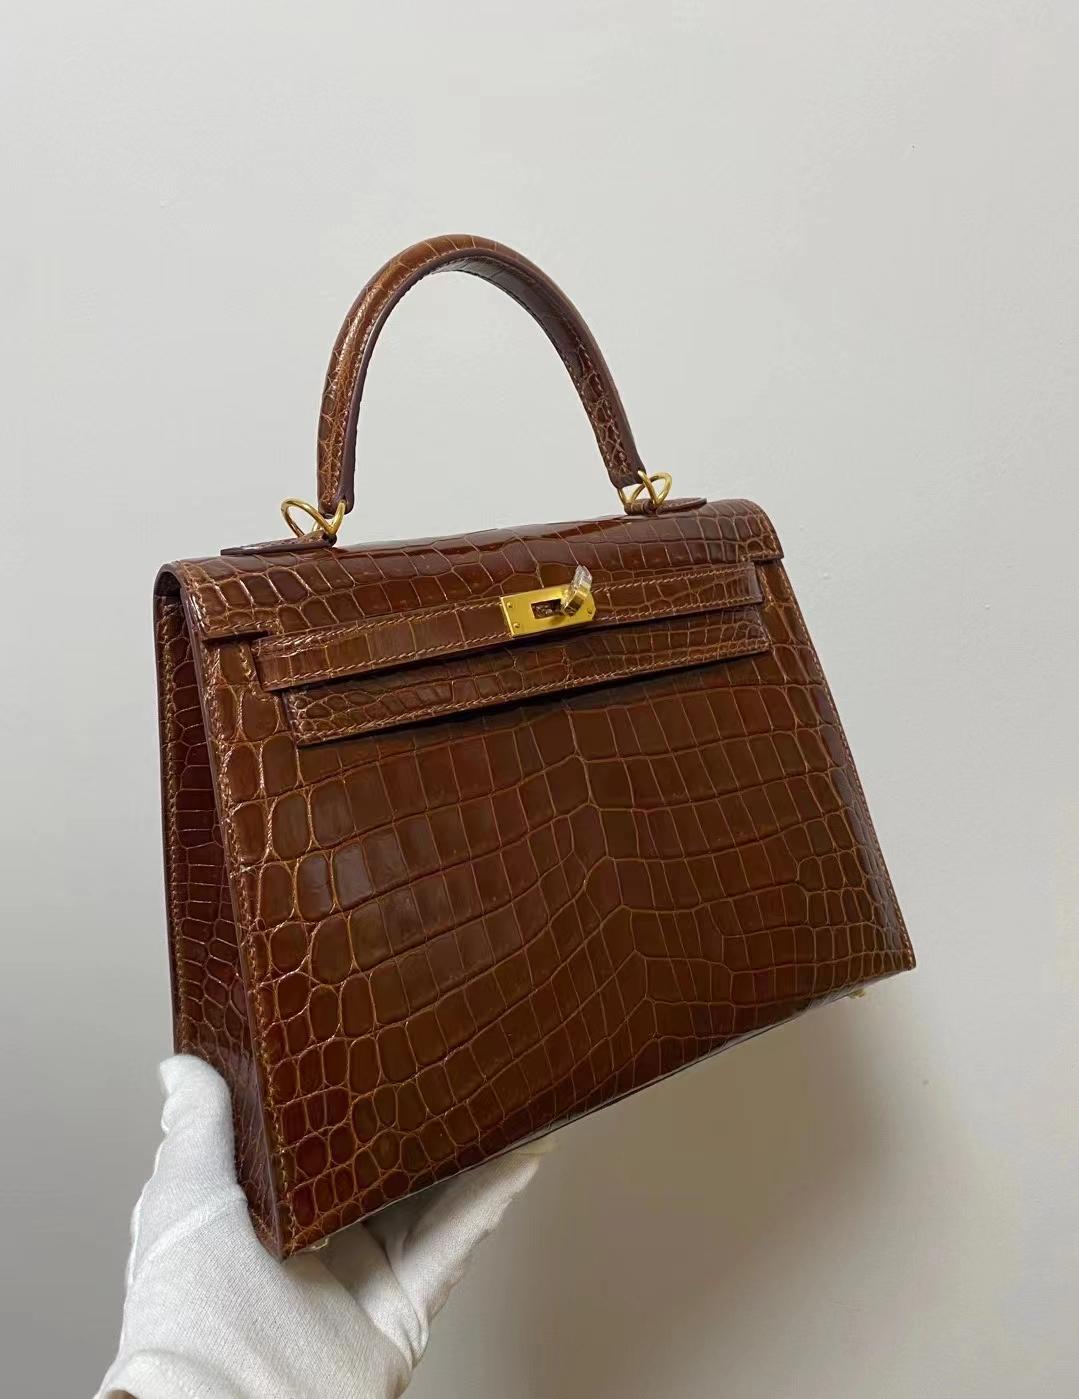 Hermès(爱马仕)Kelly 25cm 金扣 焦糖色 亮面尼罗鳄 新货